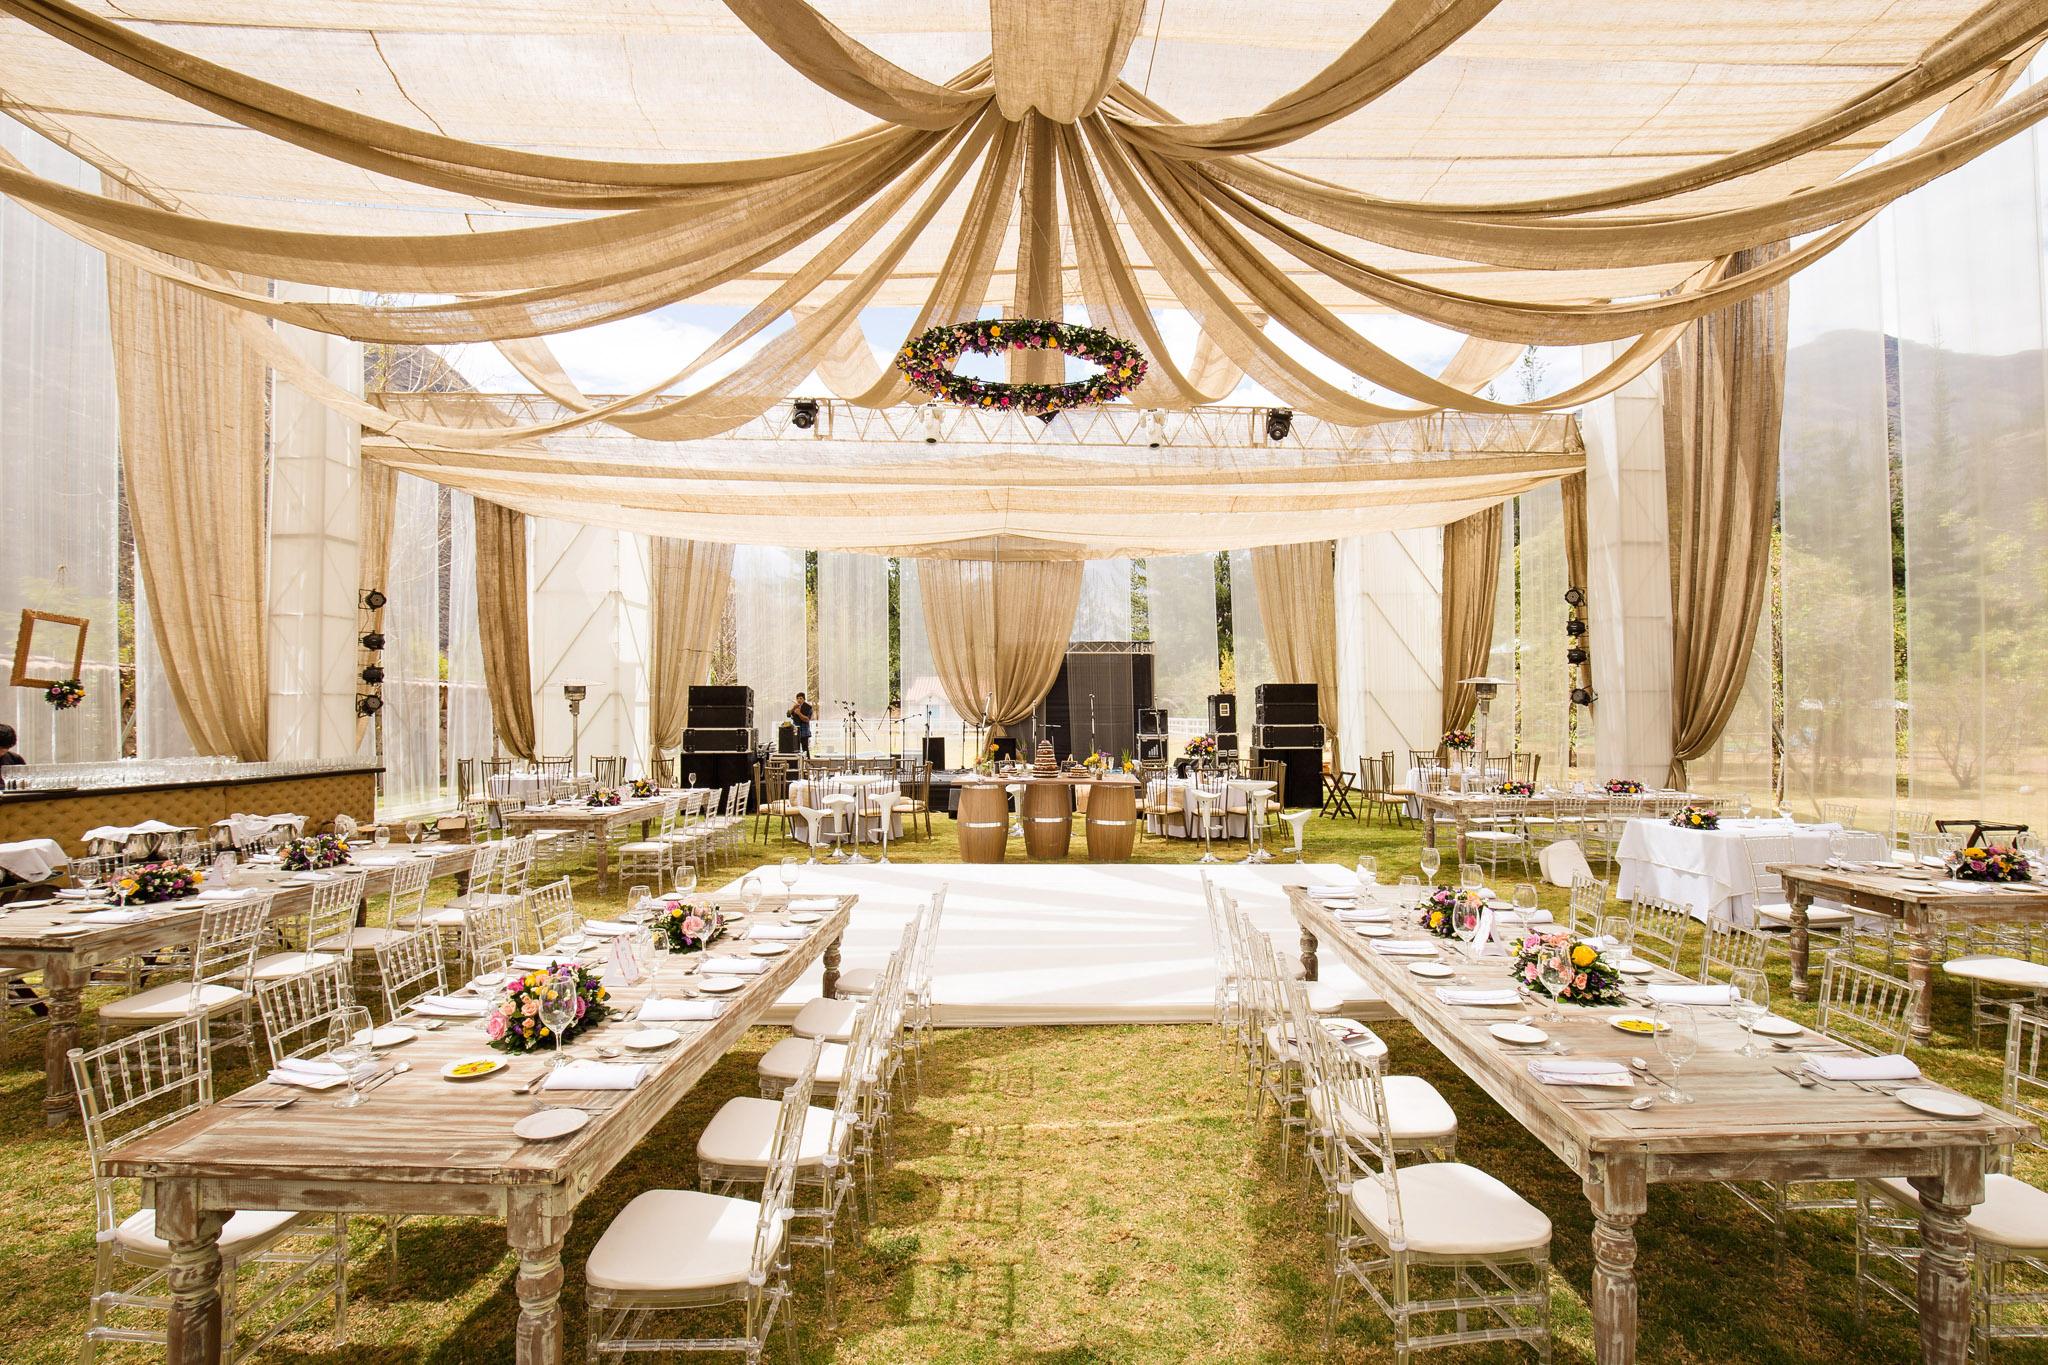 Wedding-Travellers-Destination-Wedding-Peru-Cusco-Hacienda-Sarapampa-Sacred-Valley-tent-outside-wood-natural-linen-light-brown